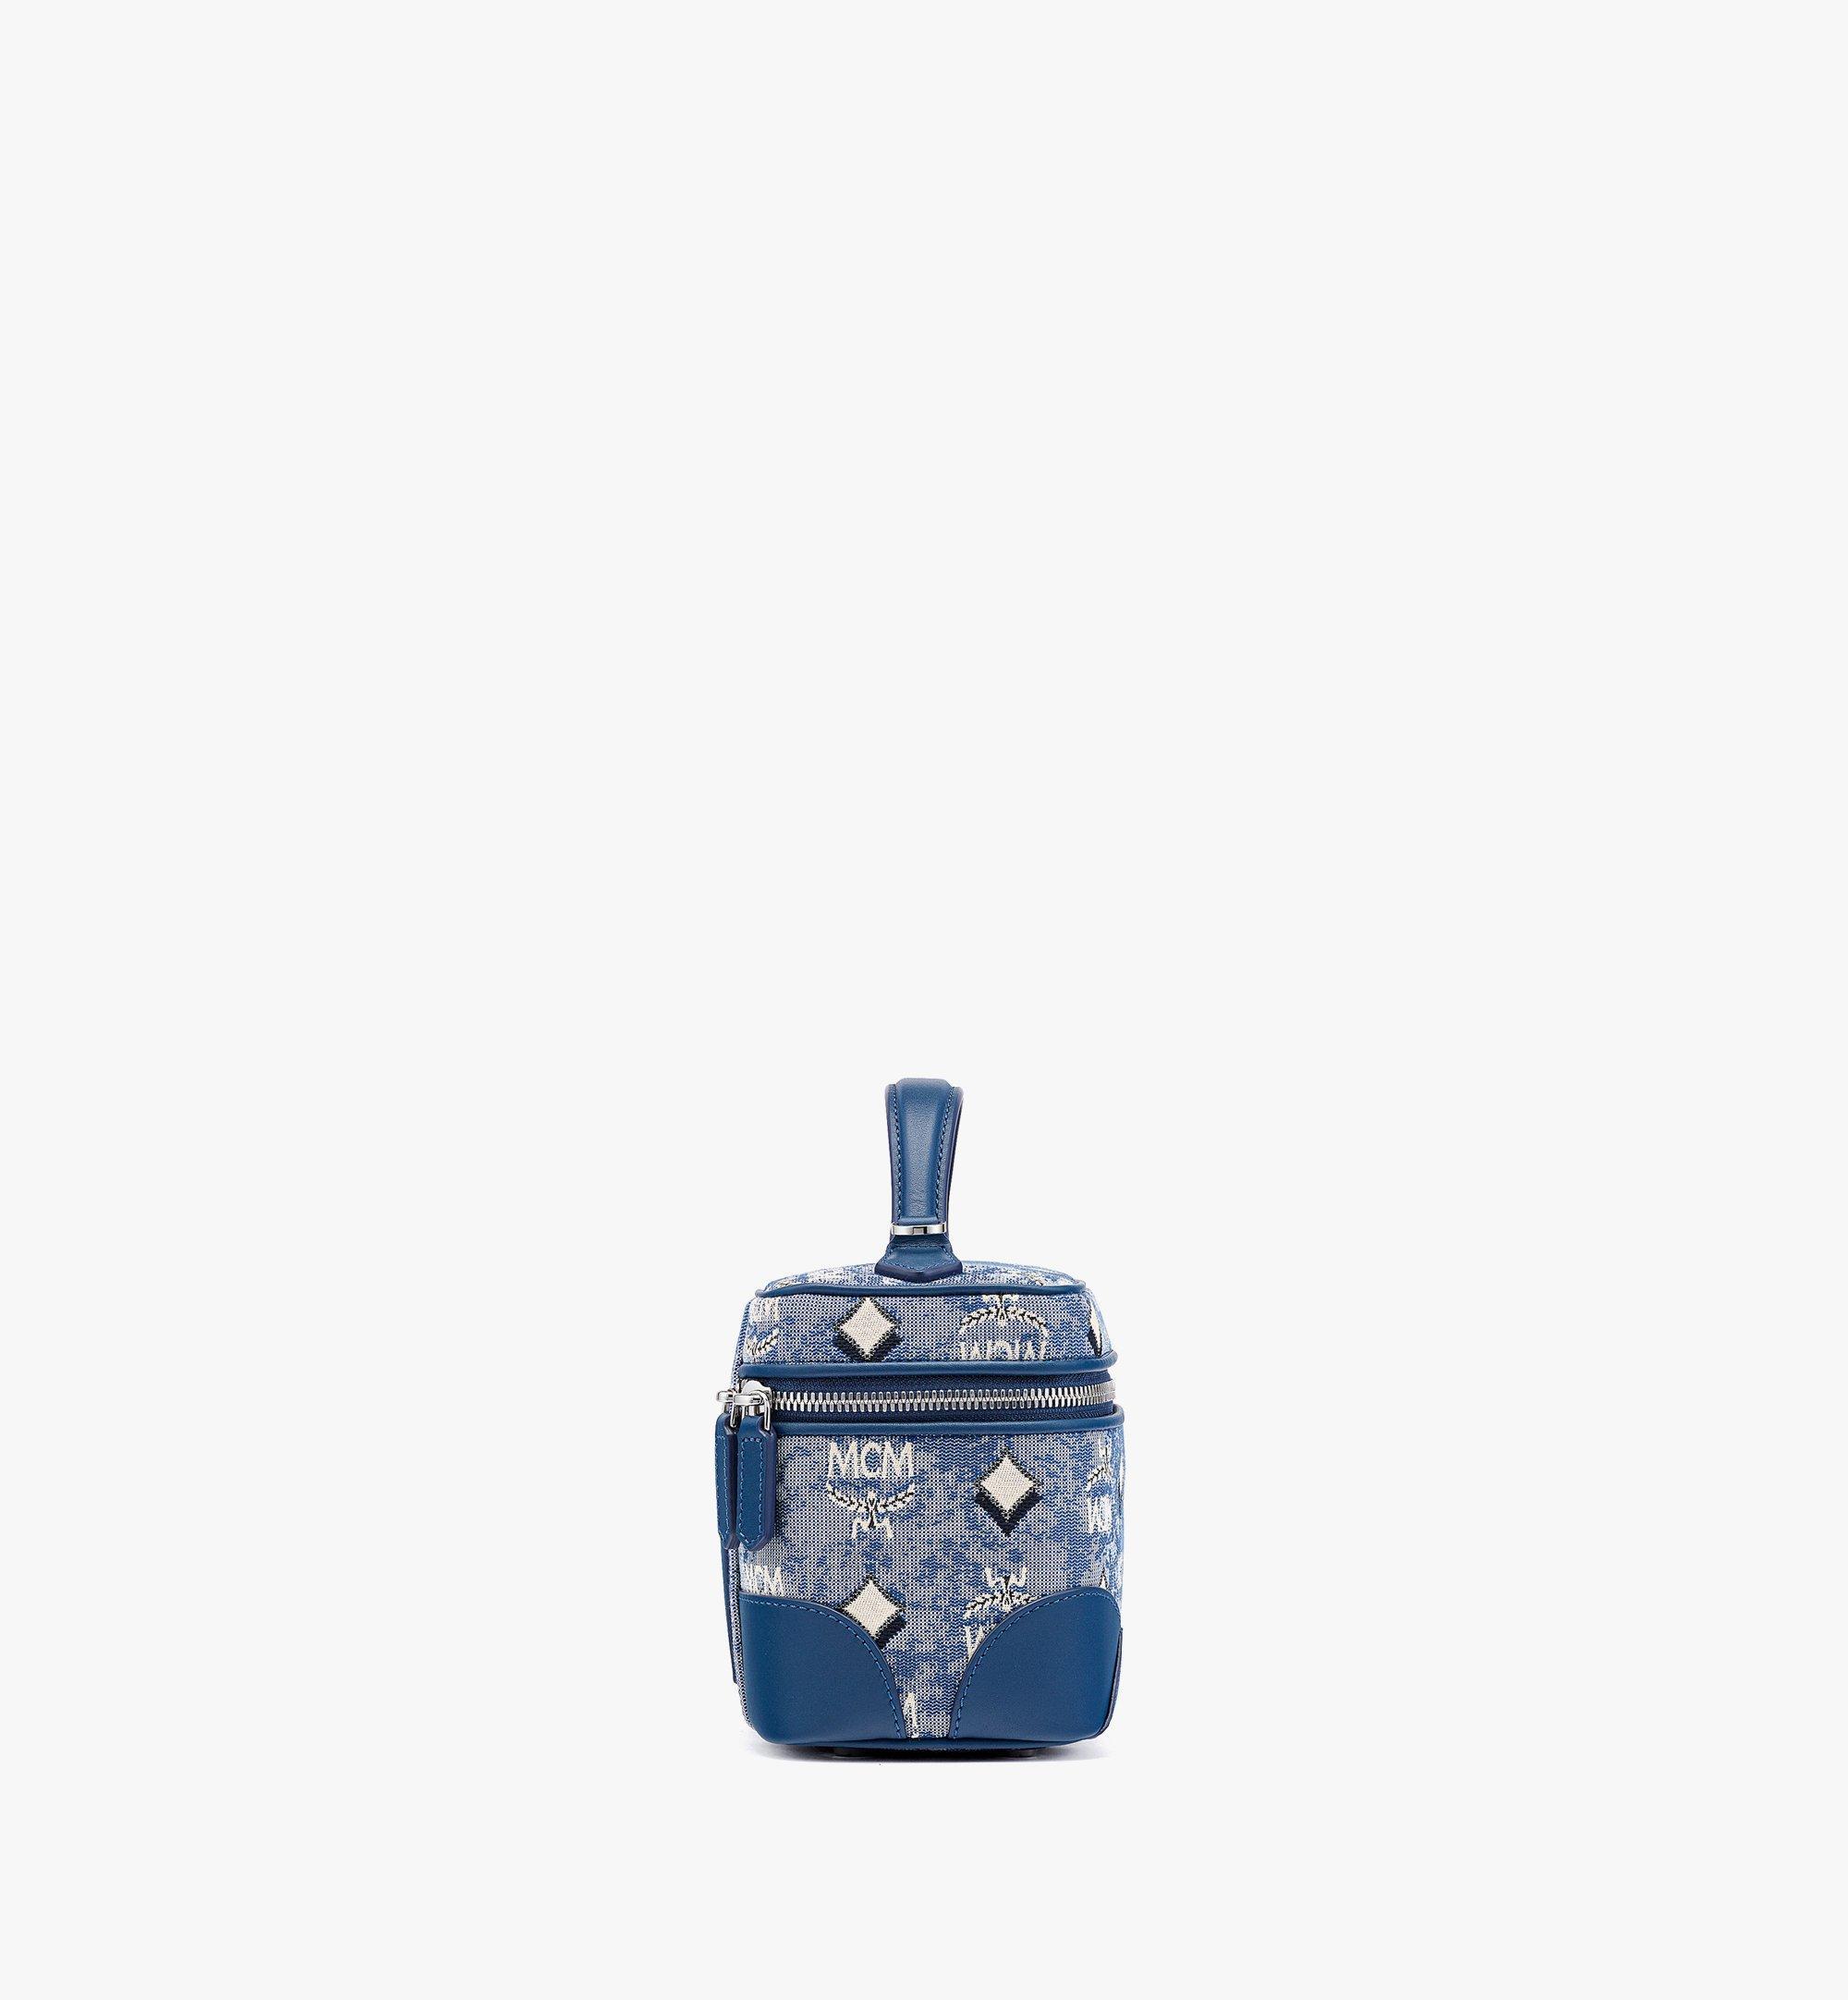 MCM Vanity-case Rockstar en jacquard monogrammé vintage Blue MWRBATQ01LU001 Plus de photos 1